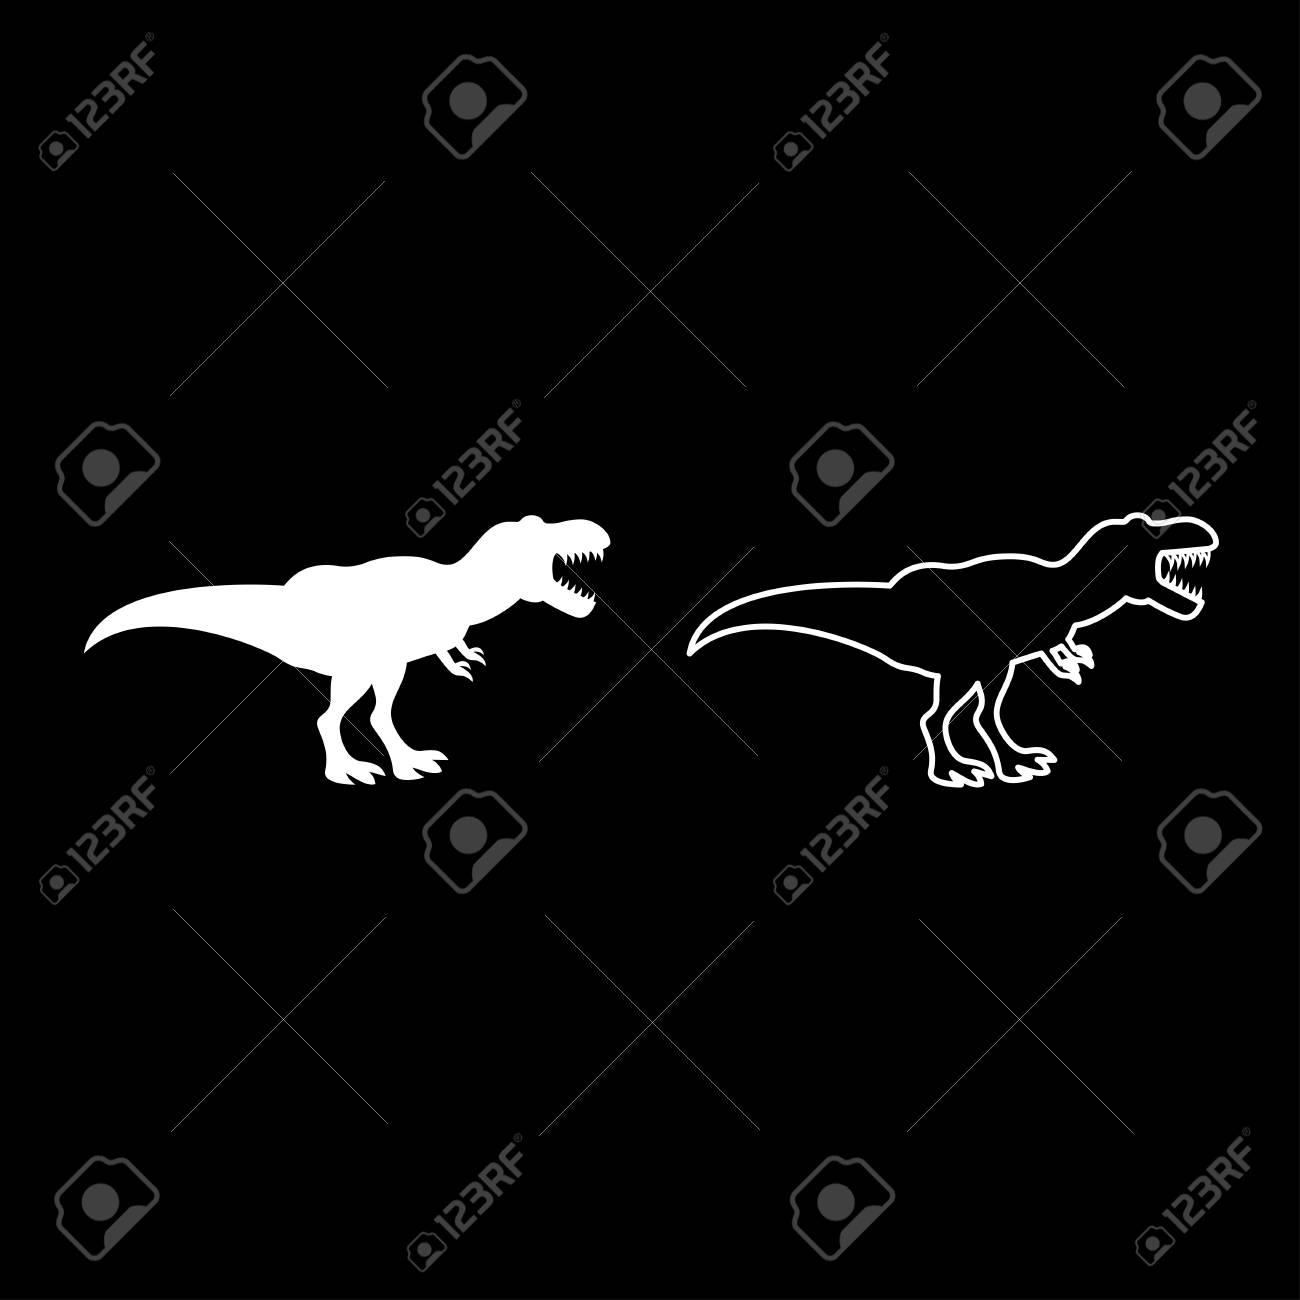 Dinosaur tyrannosaurus t rex icon set white color vector illustration flat style simple image outline - 101647251